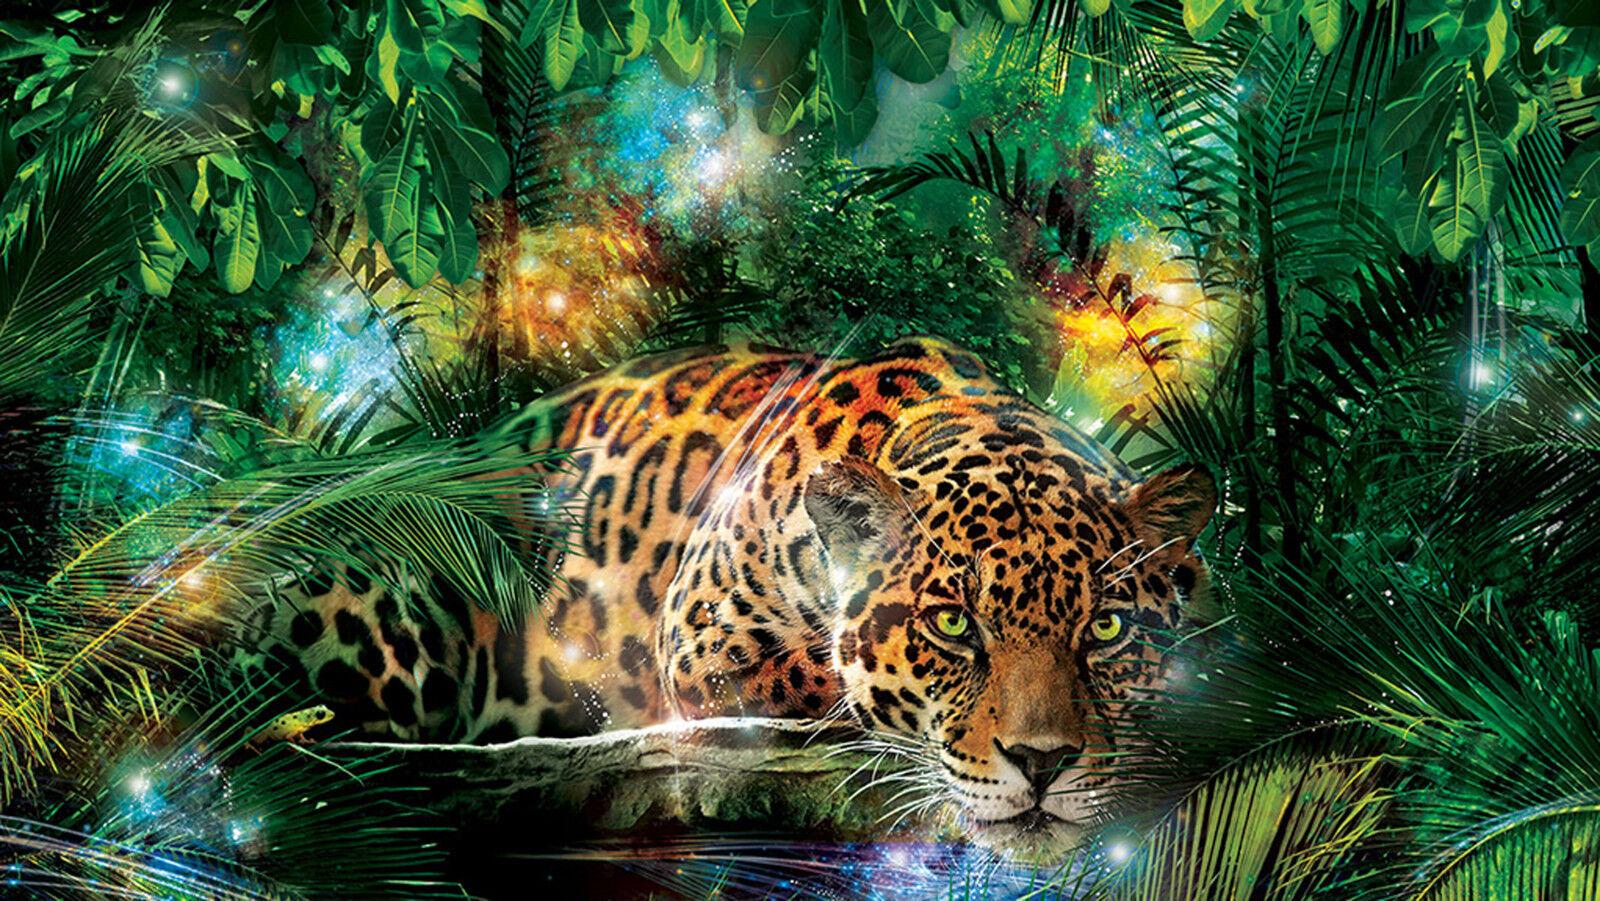 VLIES Fototapete-LEOPARD-(1333)-Raub-Tier Katze Jaguar Panther Dschungel Savanne